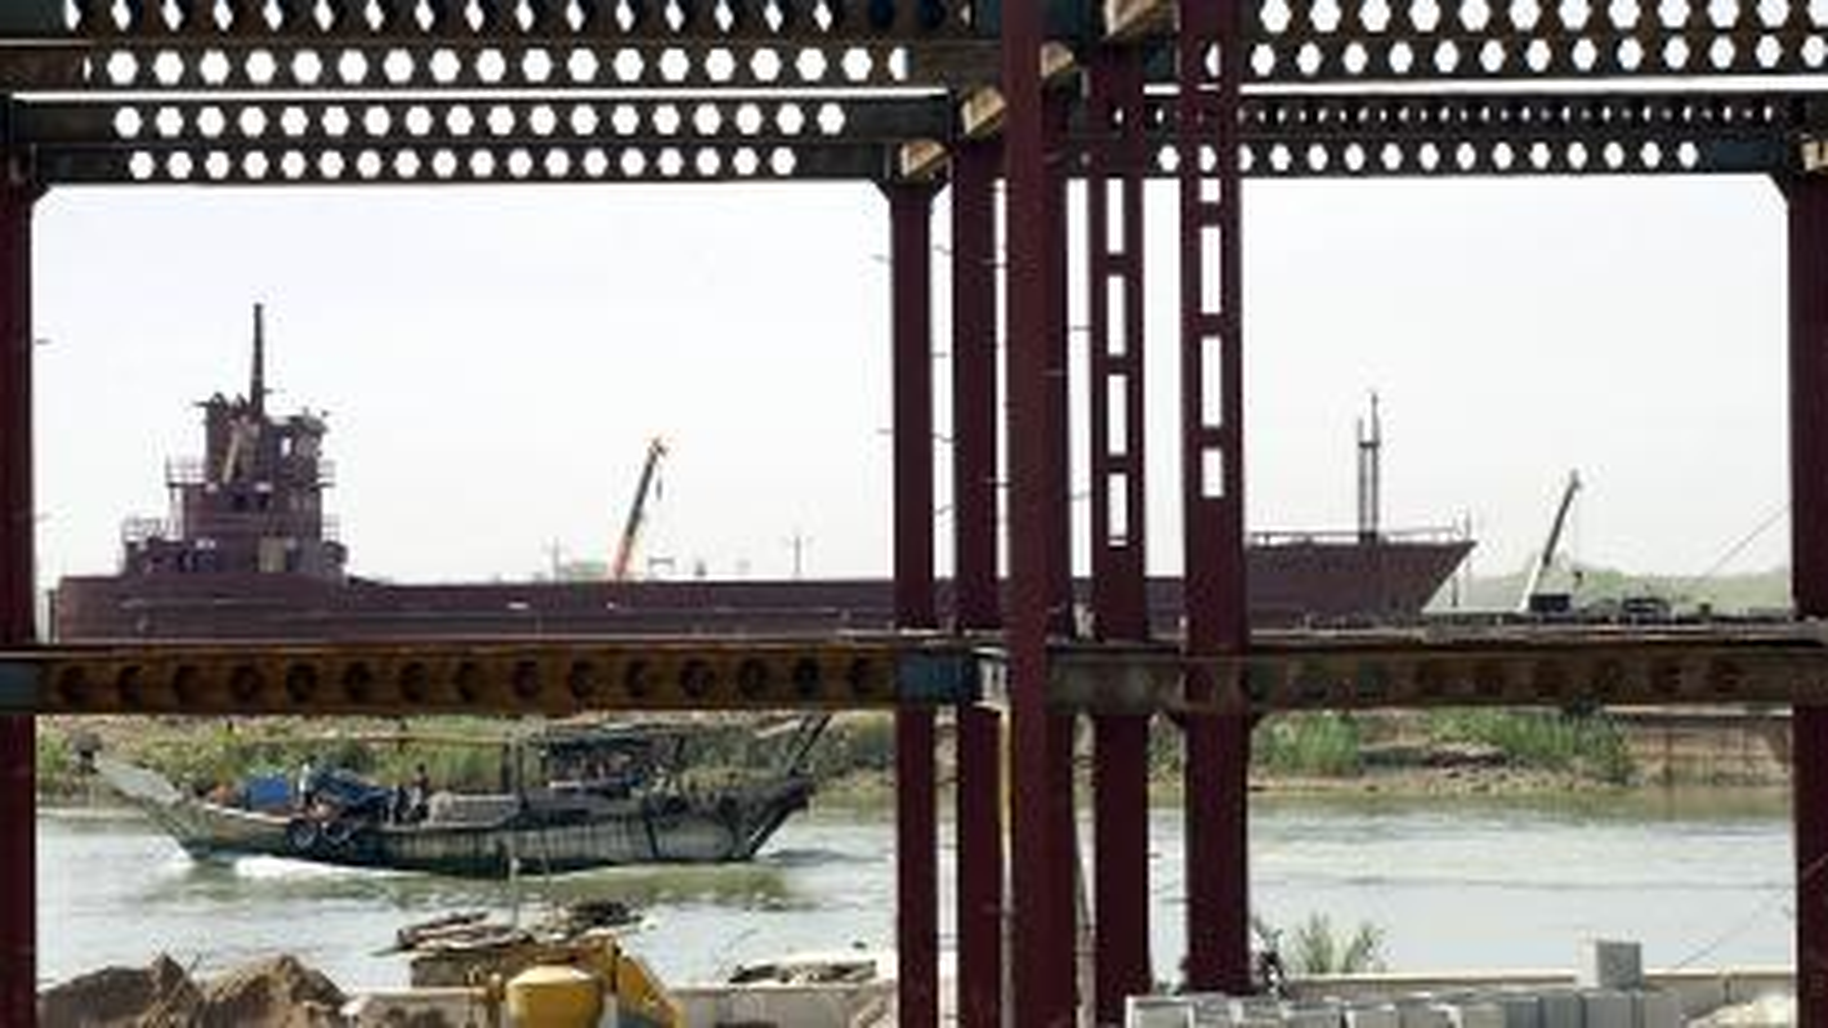 iran tanker impire shipping iran sanctions